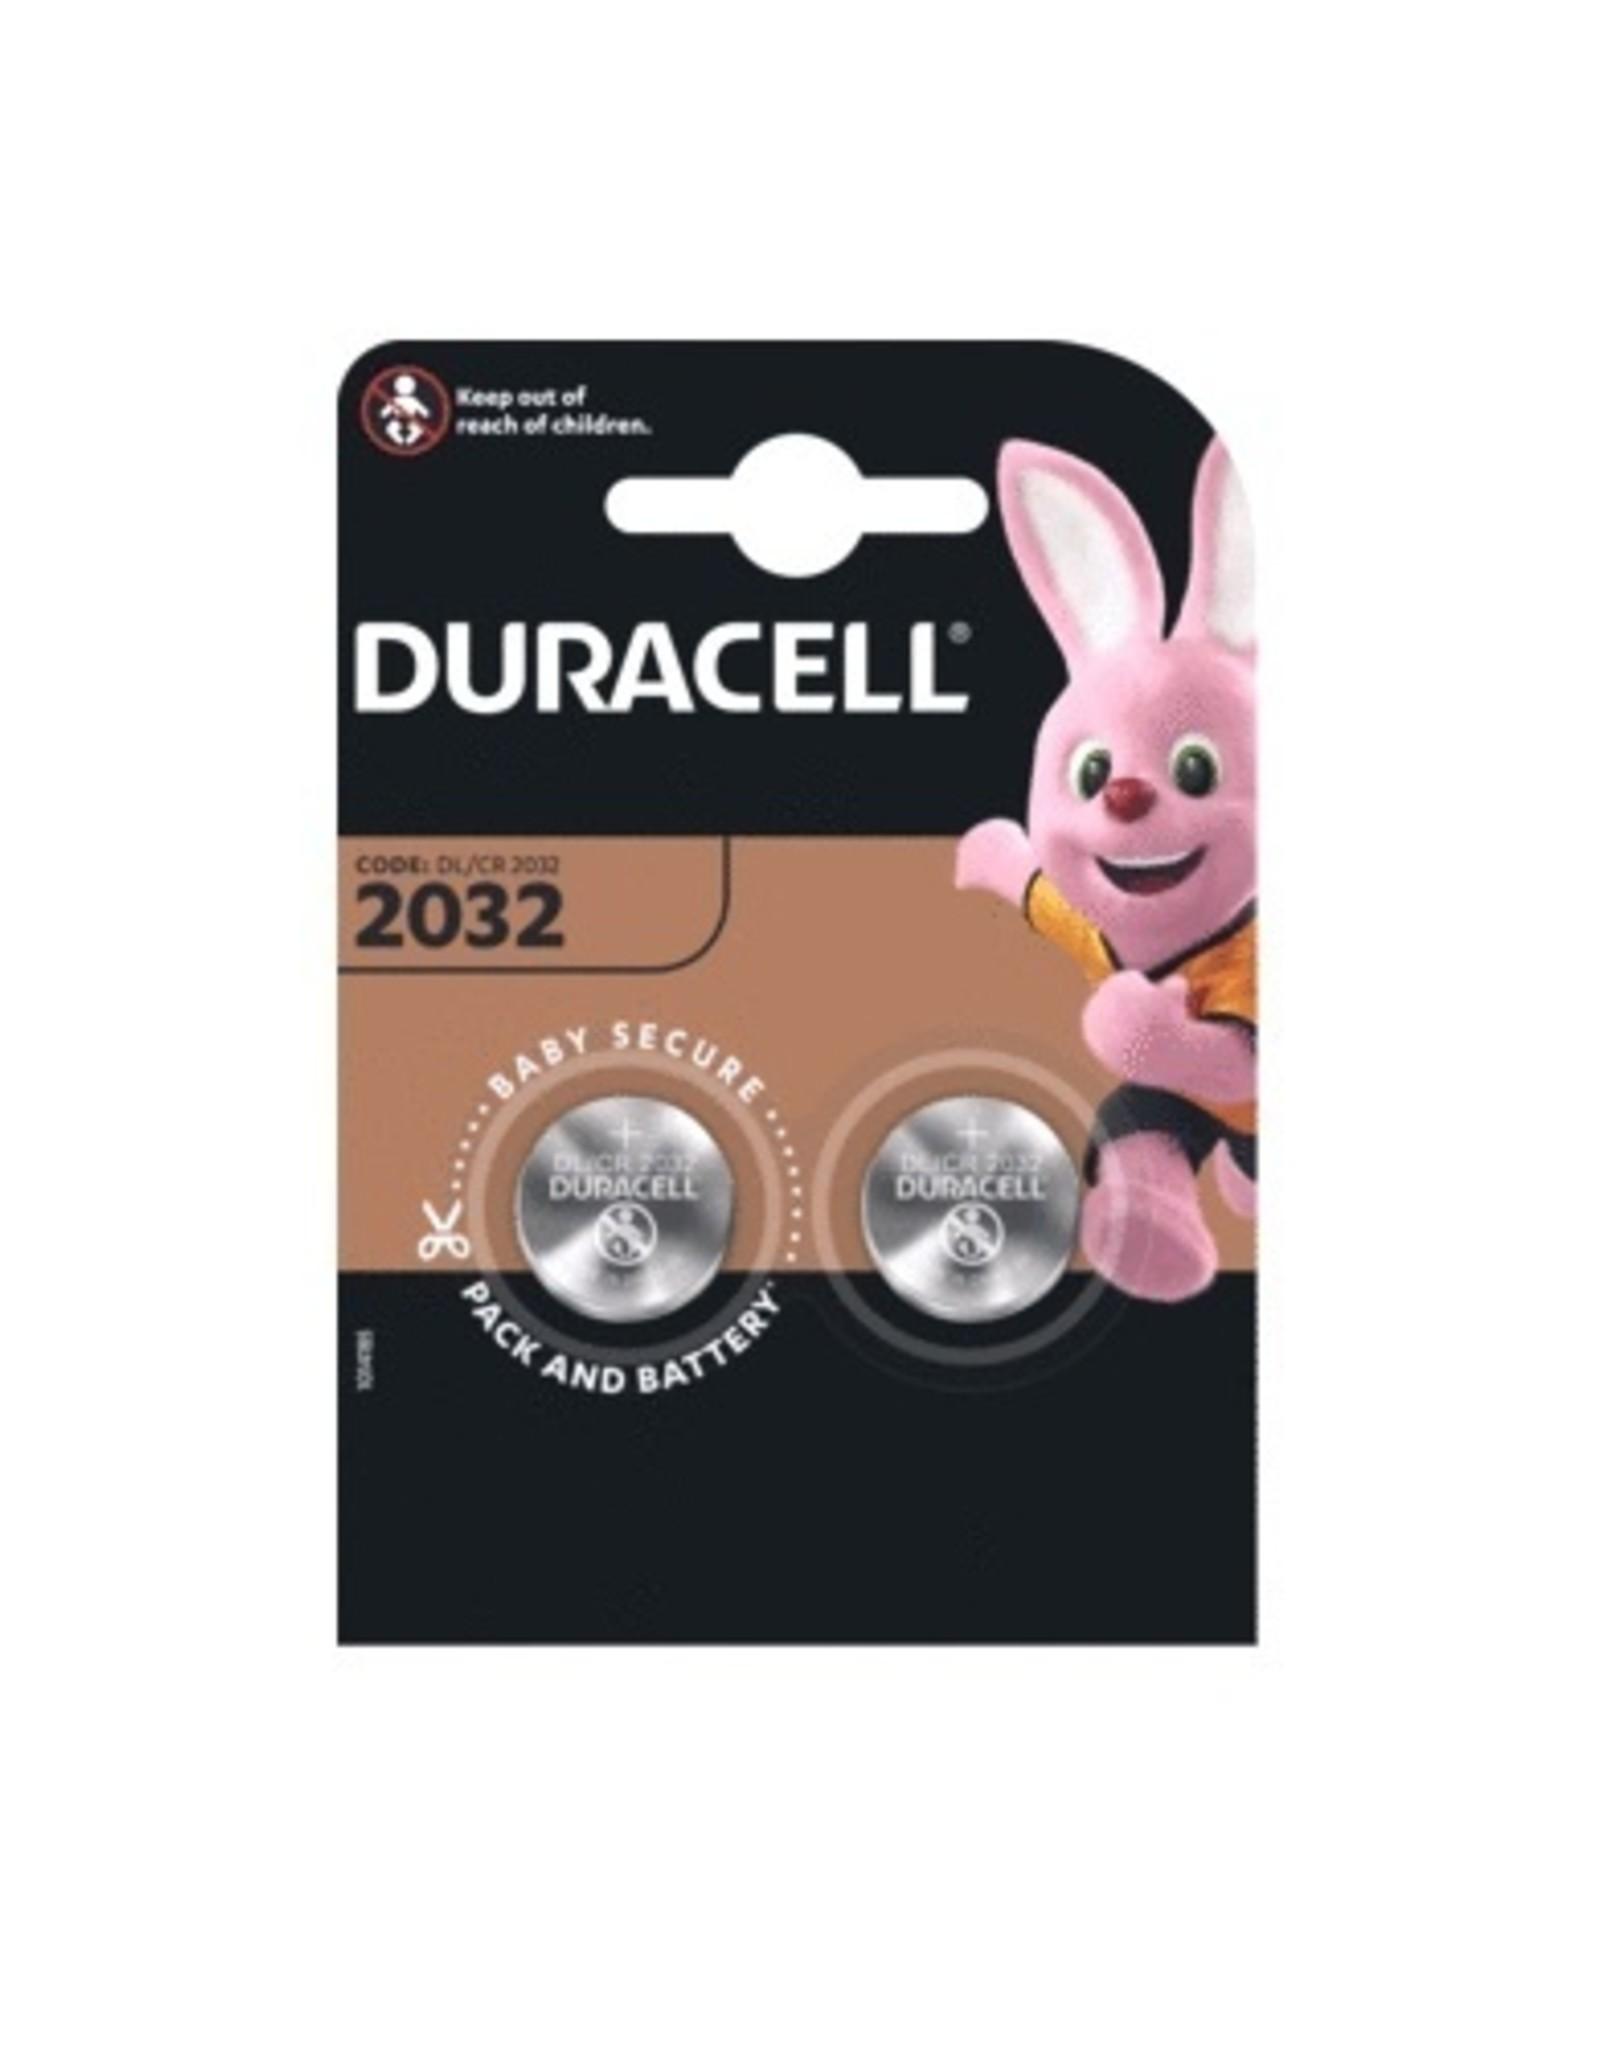 Duracell 3 Volt DR2032 knoopcel reserve batterij